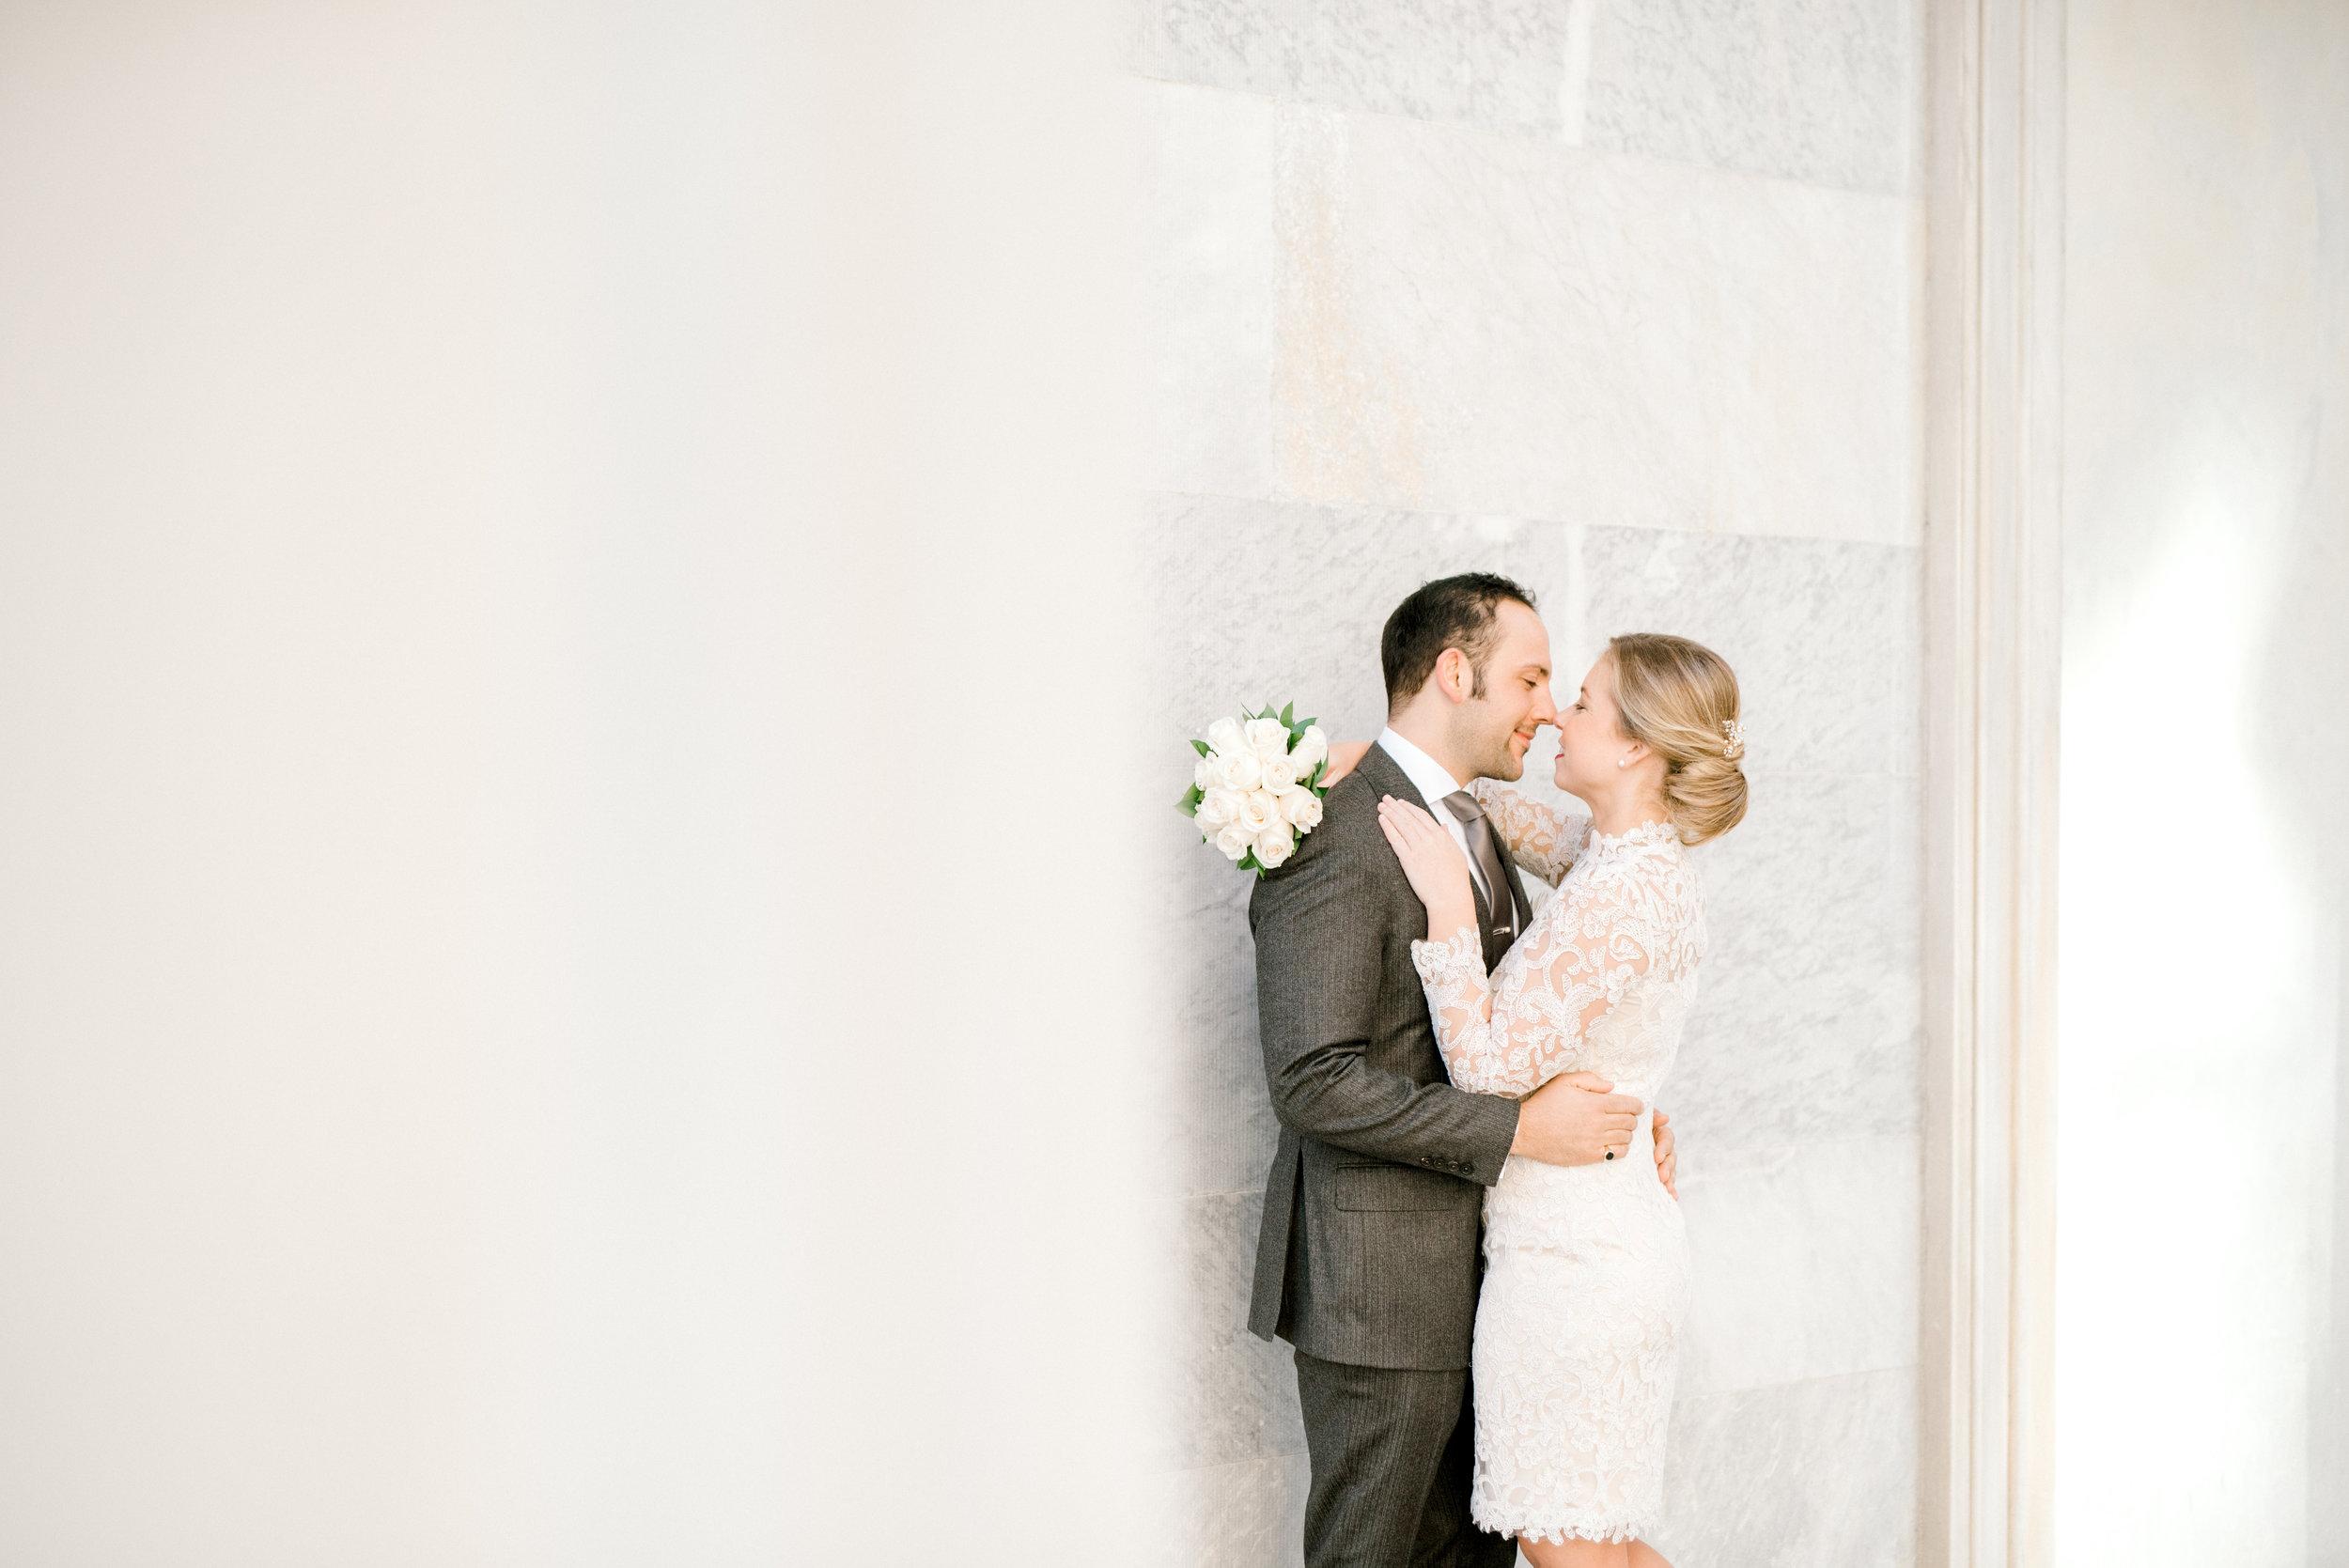 haley-richter-photography-philadelphia-city-hall-elopement-024.jpg